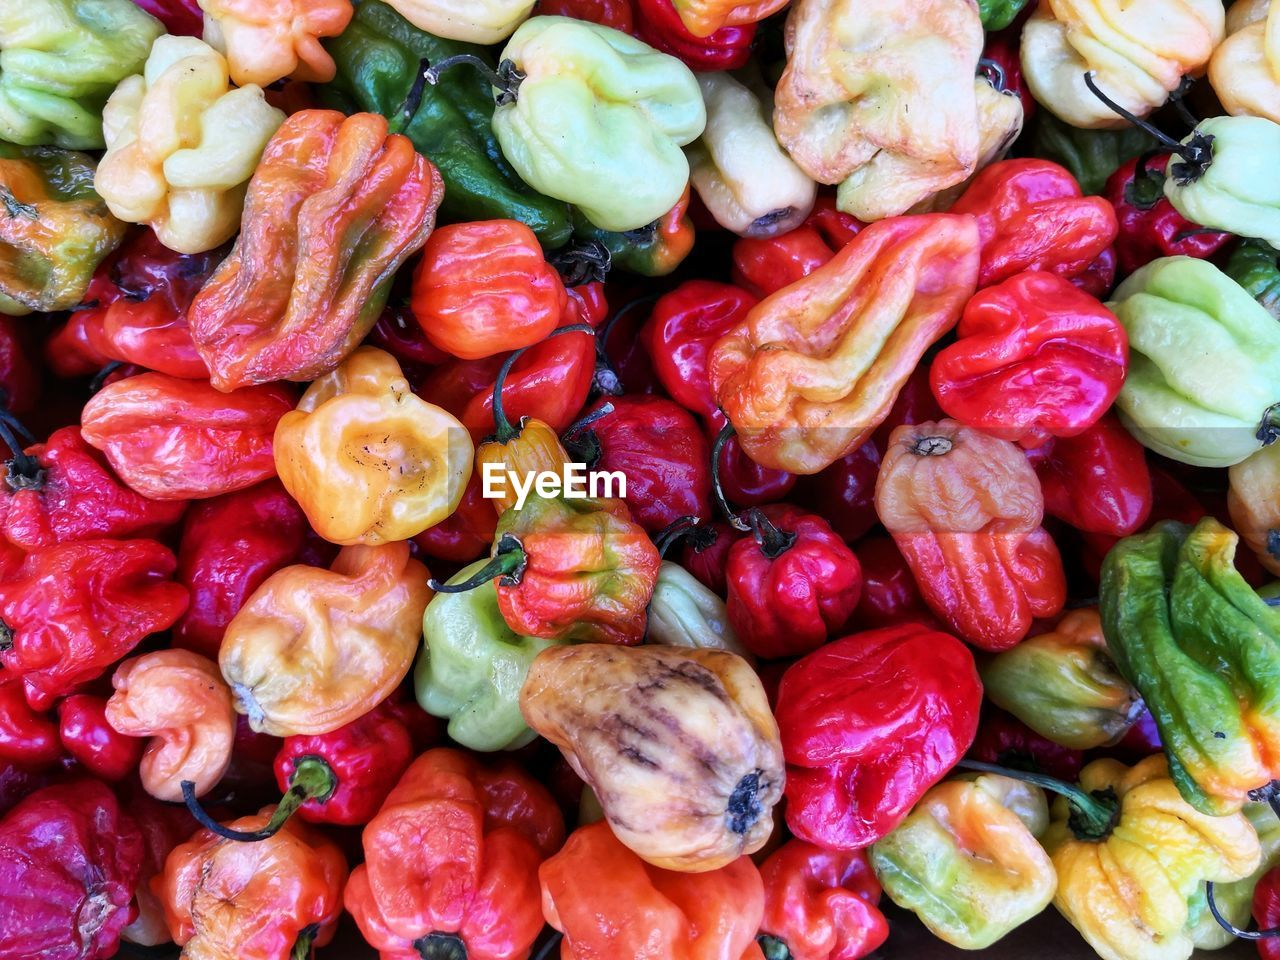 FULL FRAME SHOT OF FRUITS AND VEGETABLES